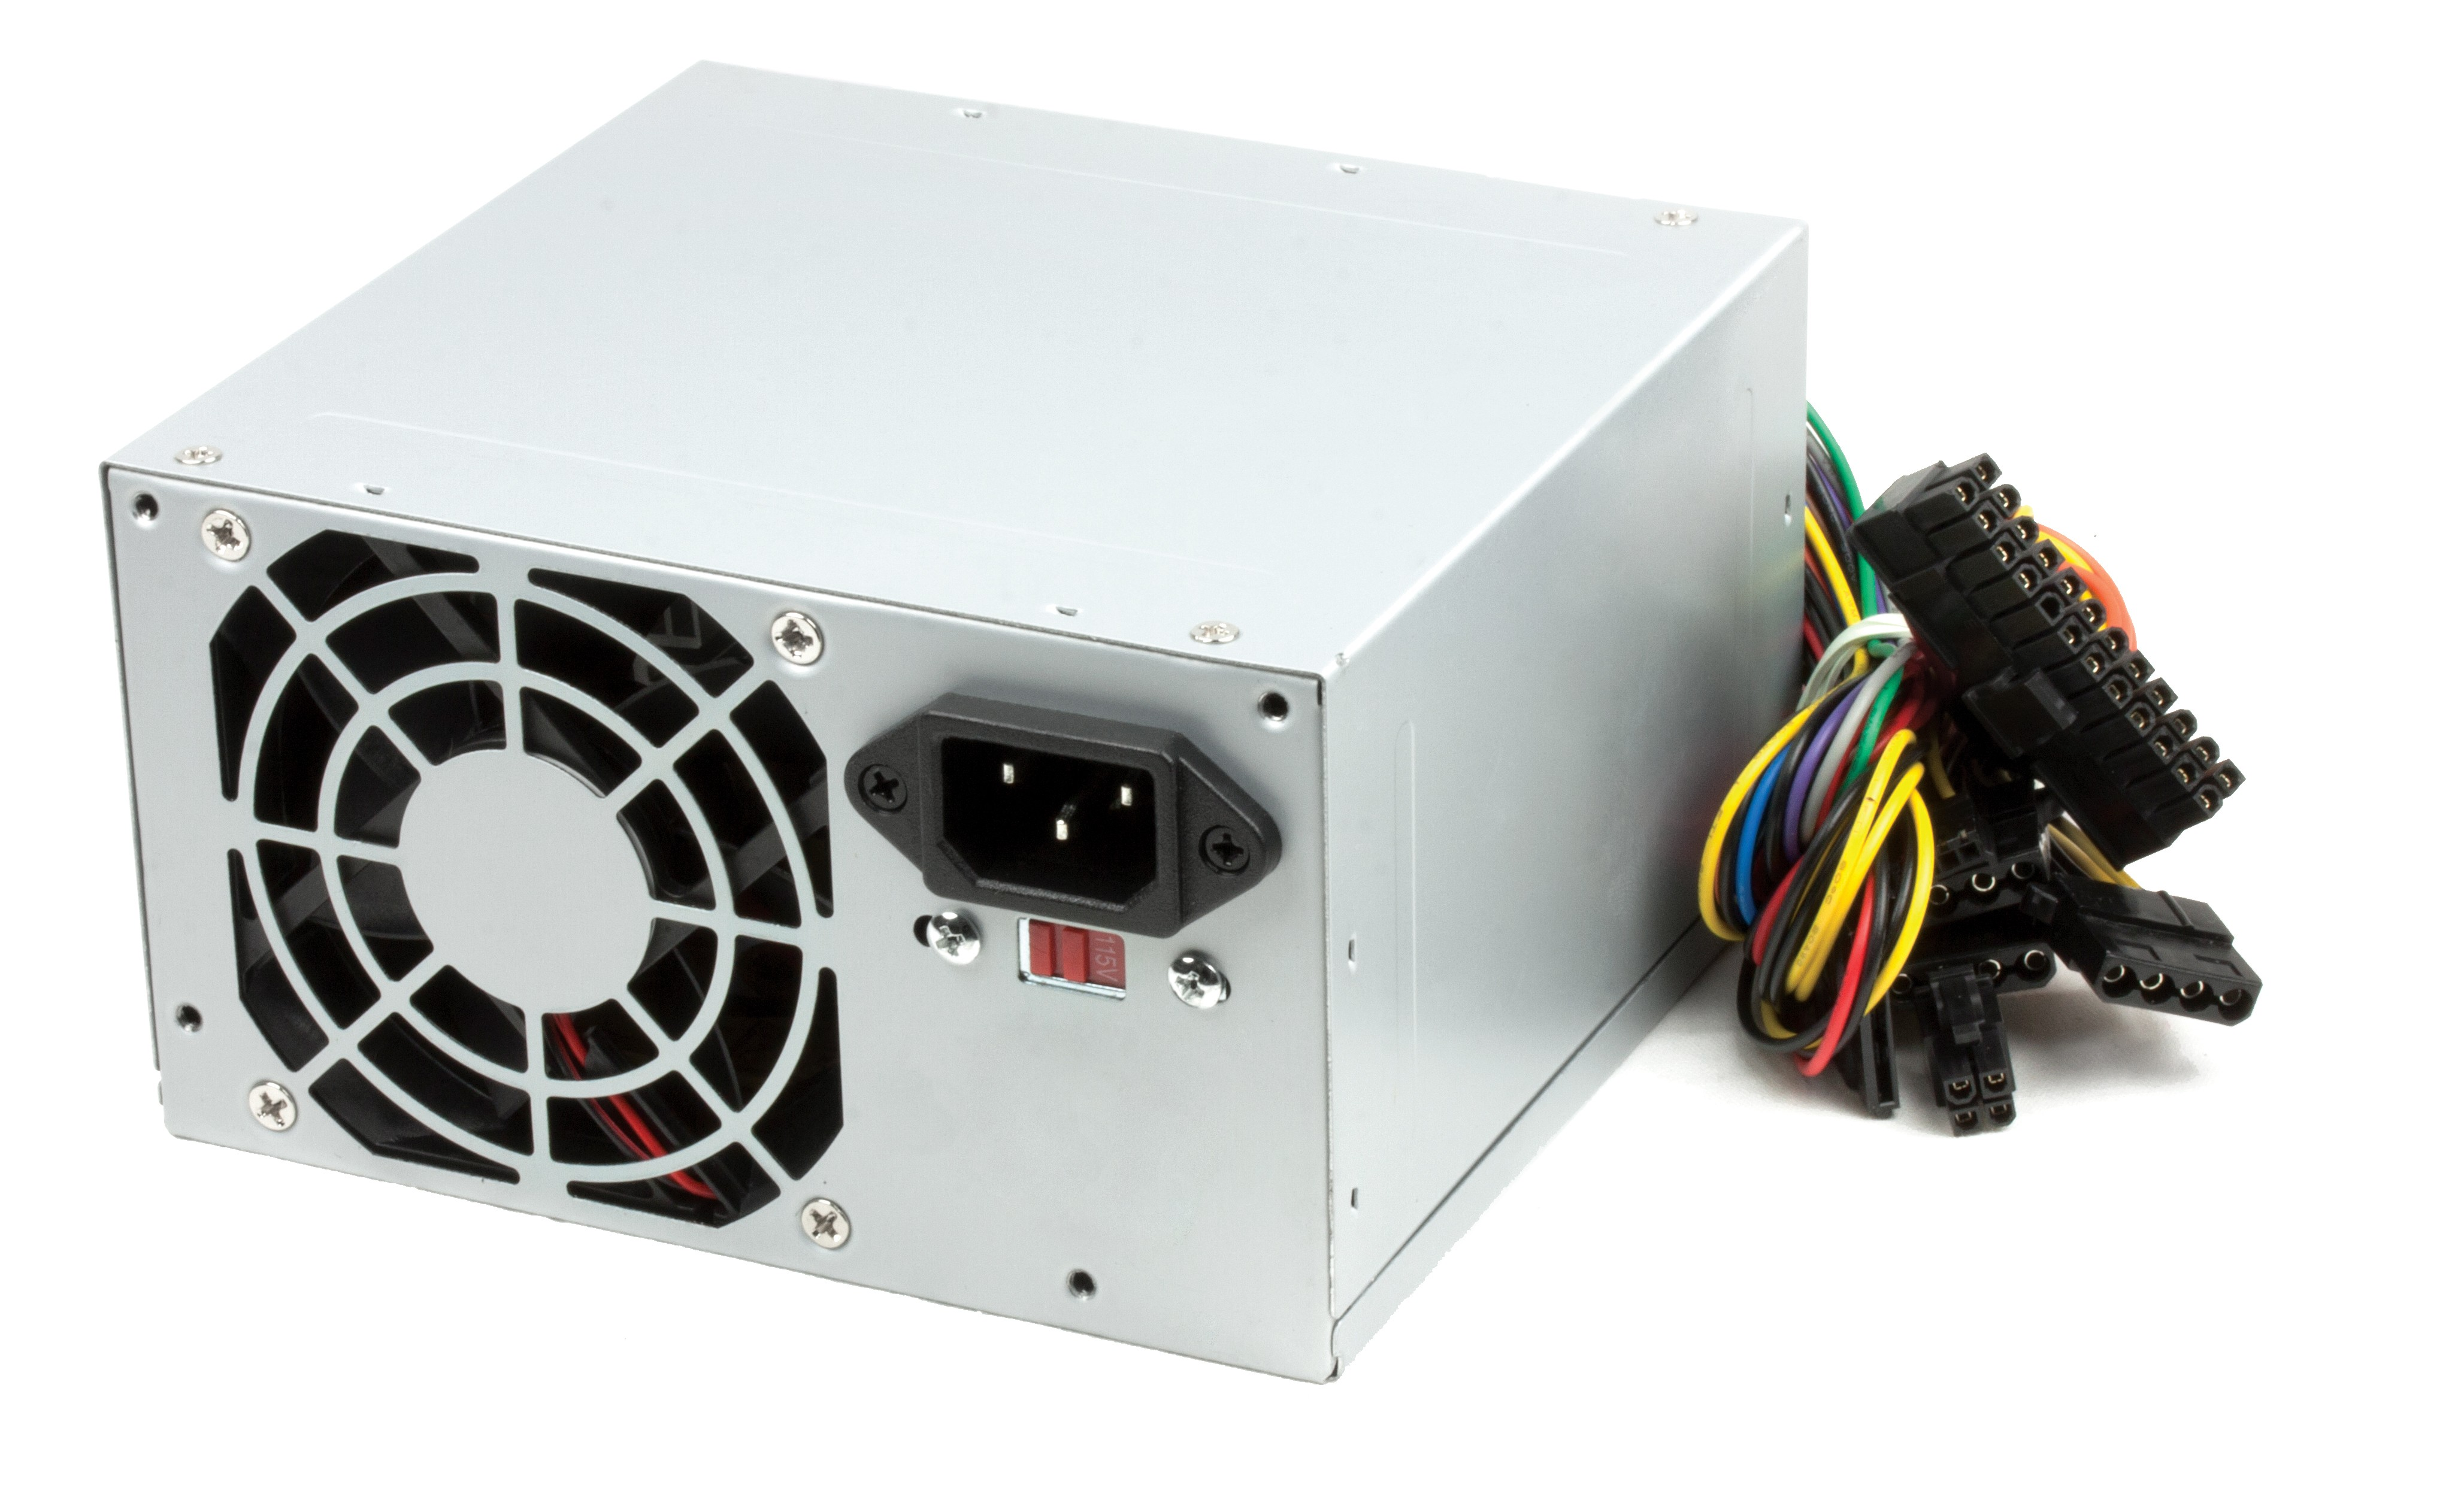 Cs850xtk11 Xtech Power Supply Internal 600 Watt Wizz